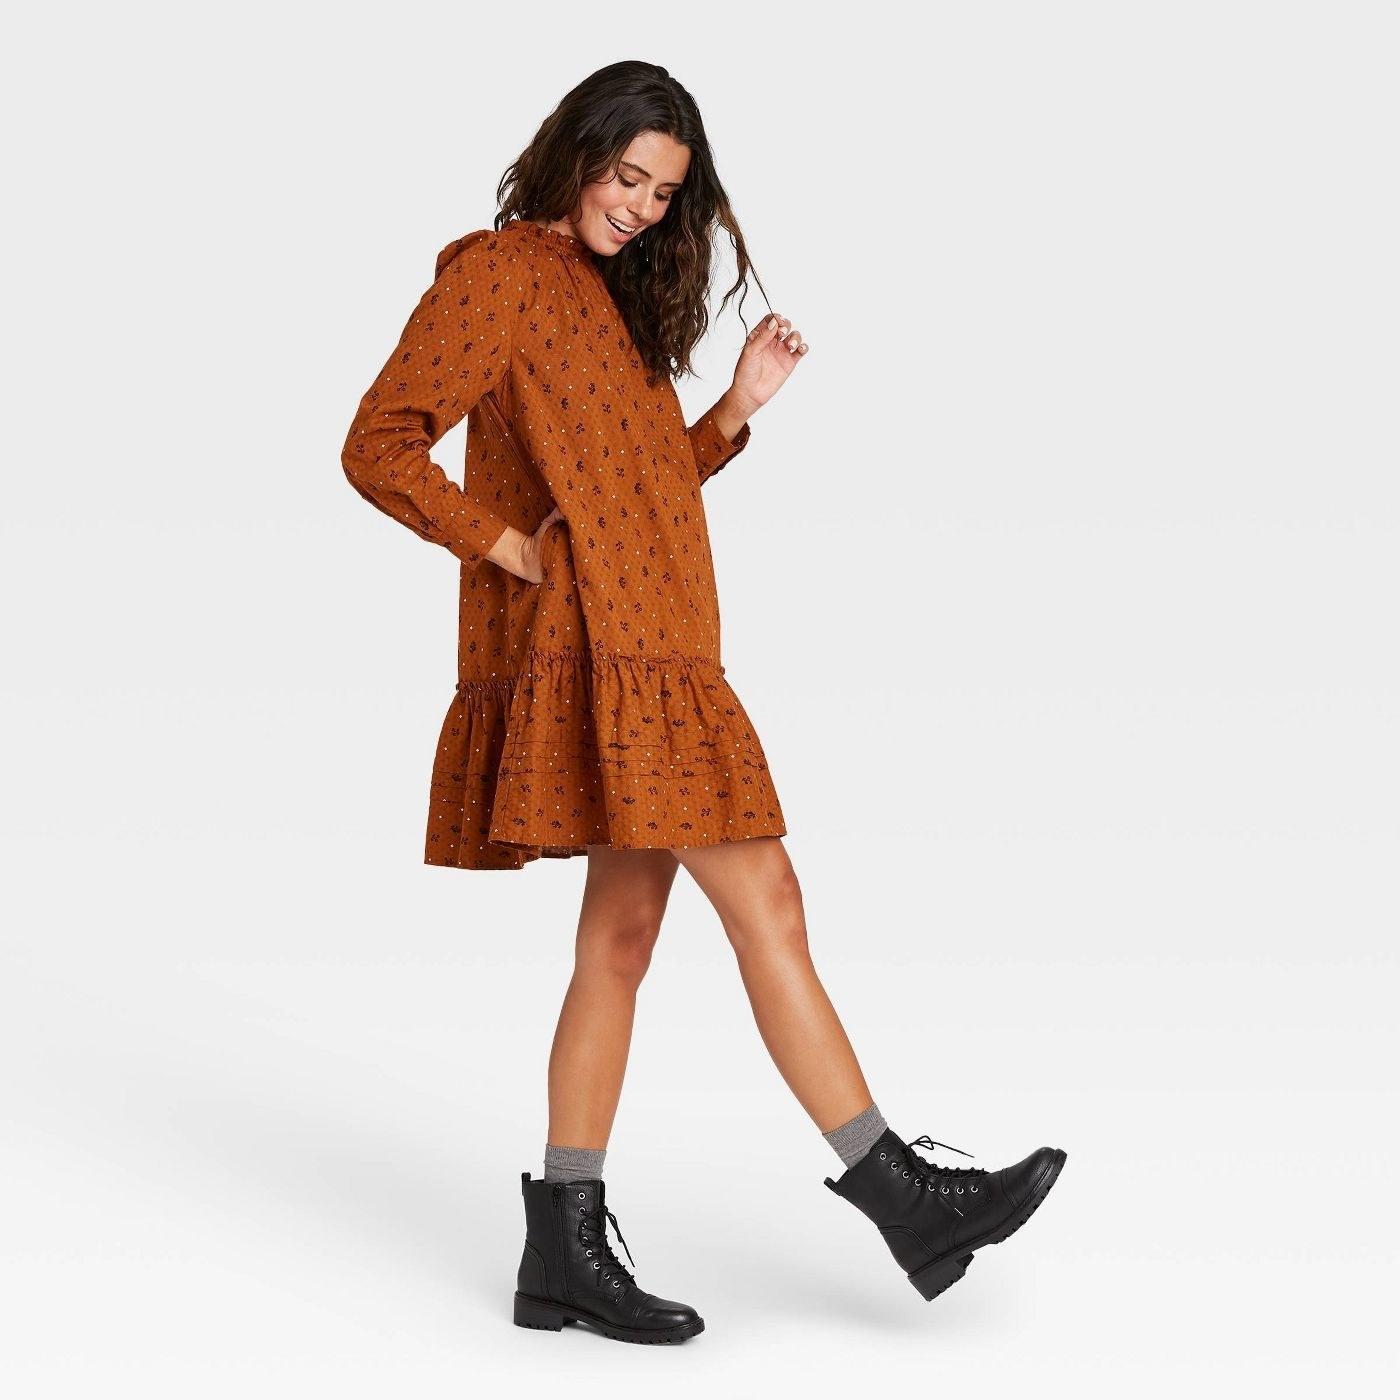 Model wearing burnt orange dress with ruffle hem, stops at the knee